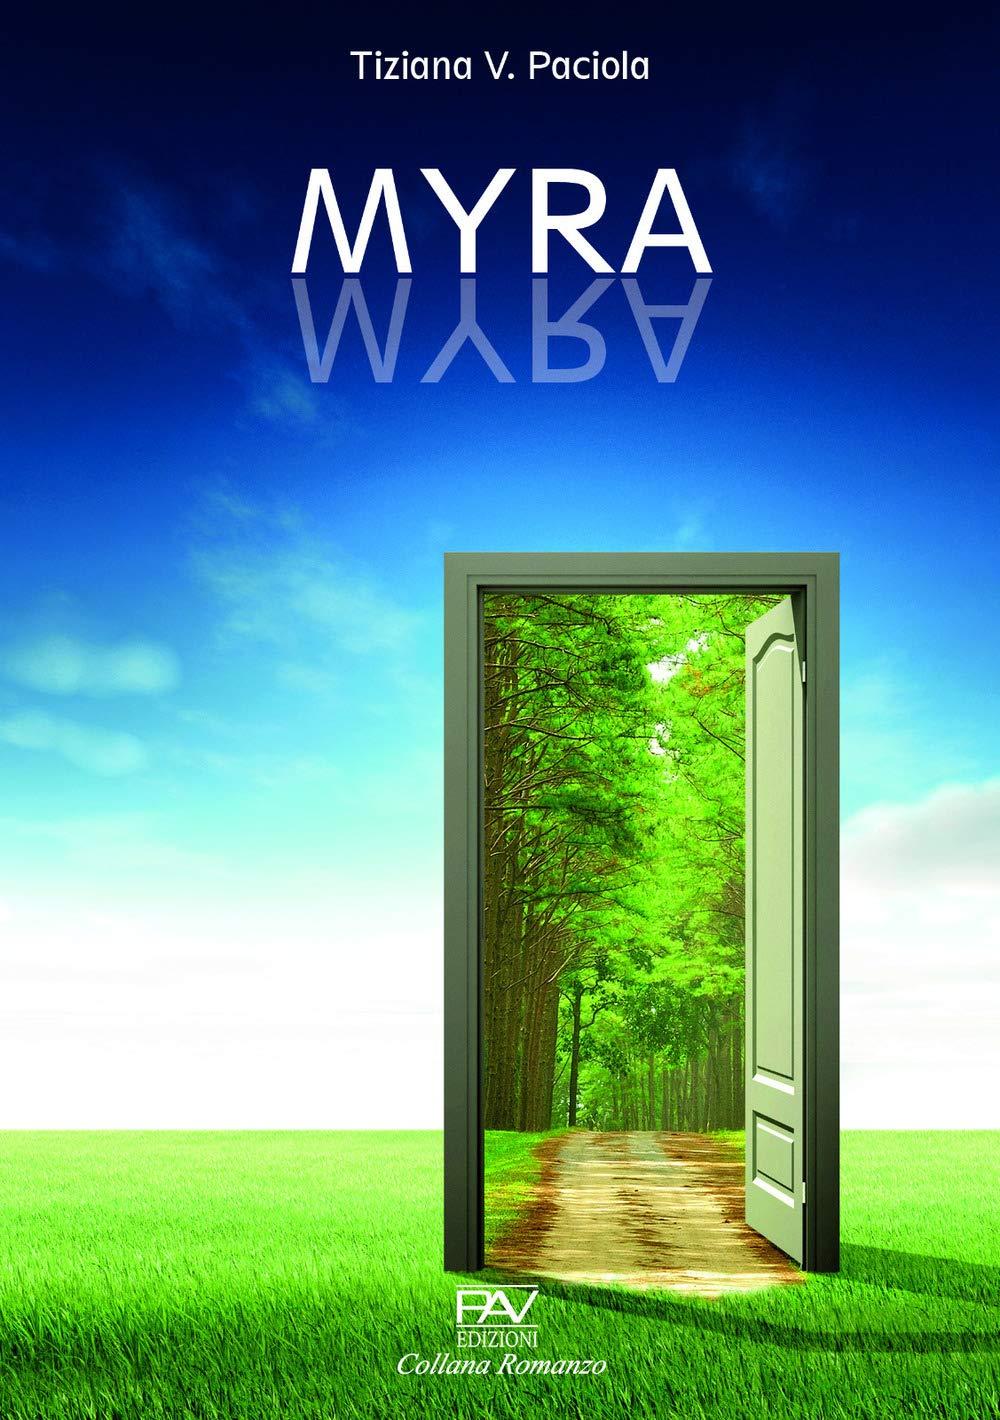 Amazon.it: Myra - Paciola, Tiziana V. - Libri